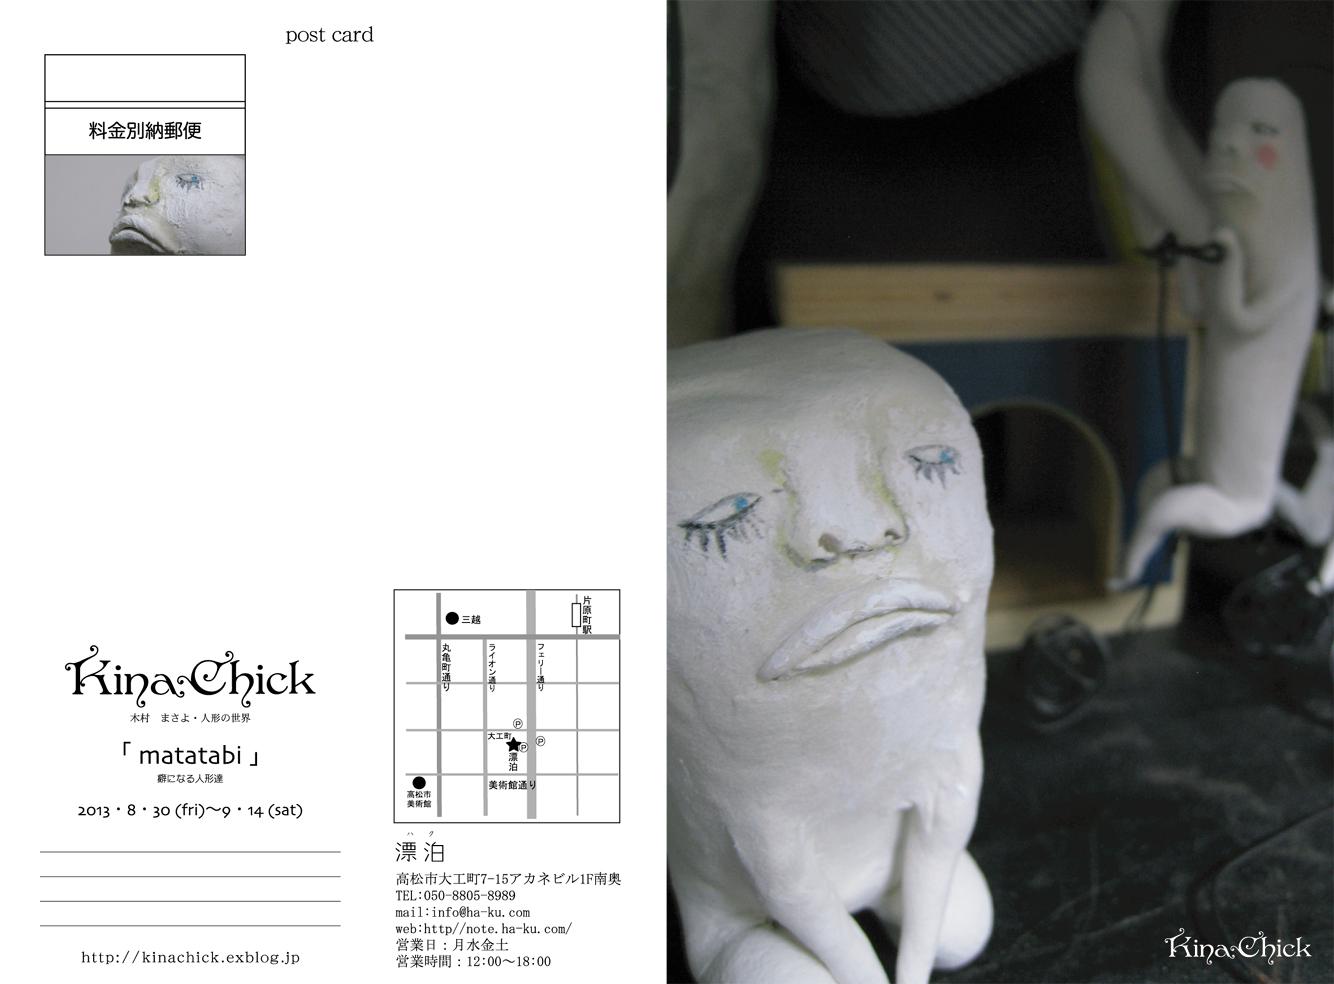 matatabi   〜癖になる人形達〜_f0235453_20121616.jpg